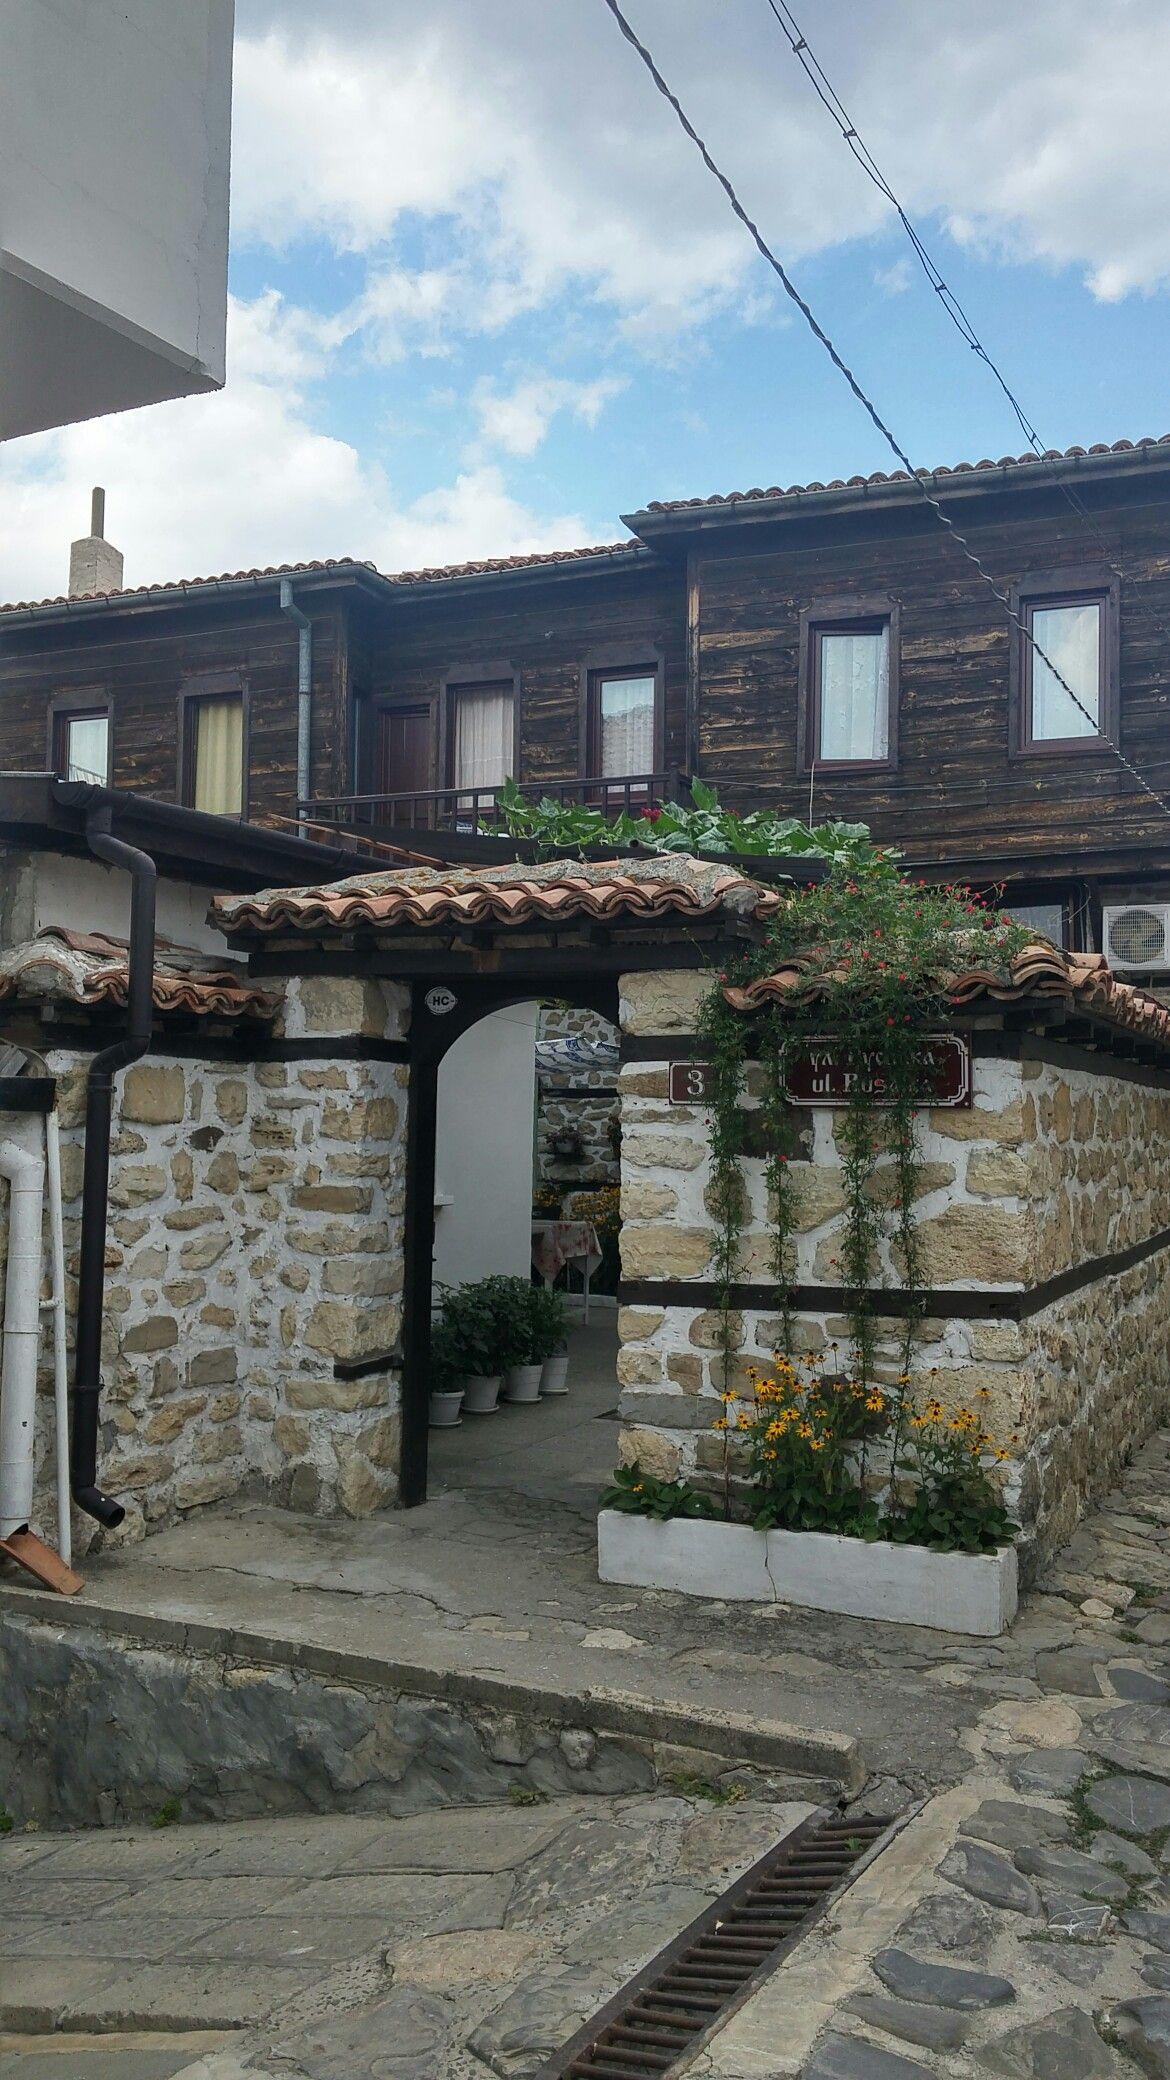 Jiz balkan Balkan Jazz